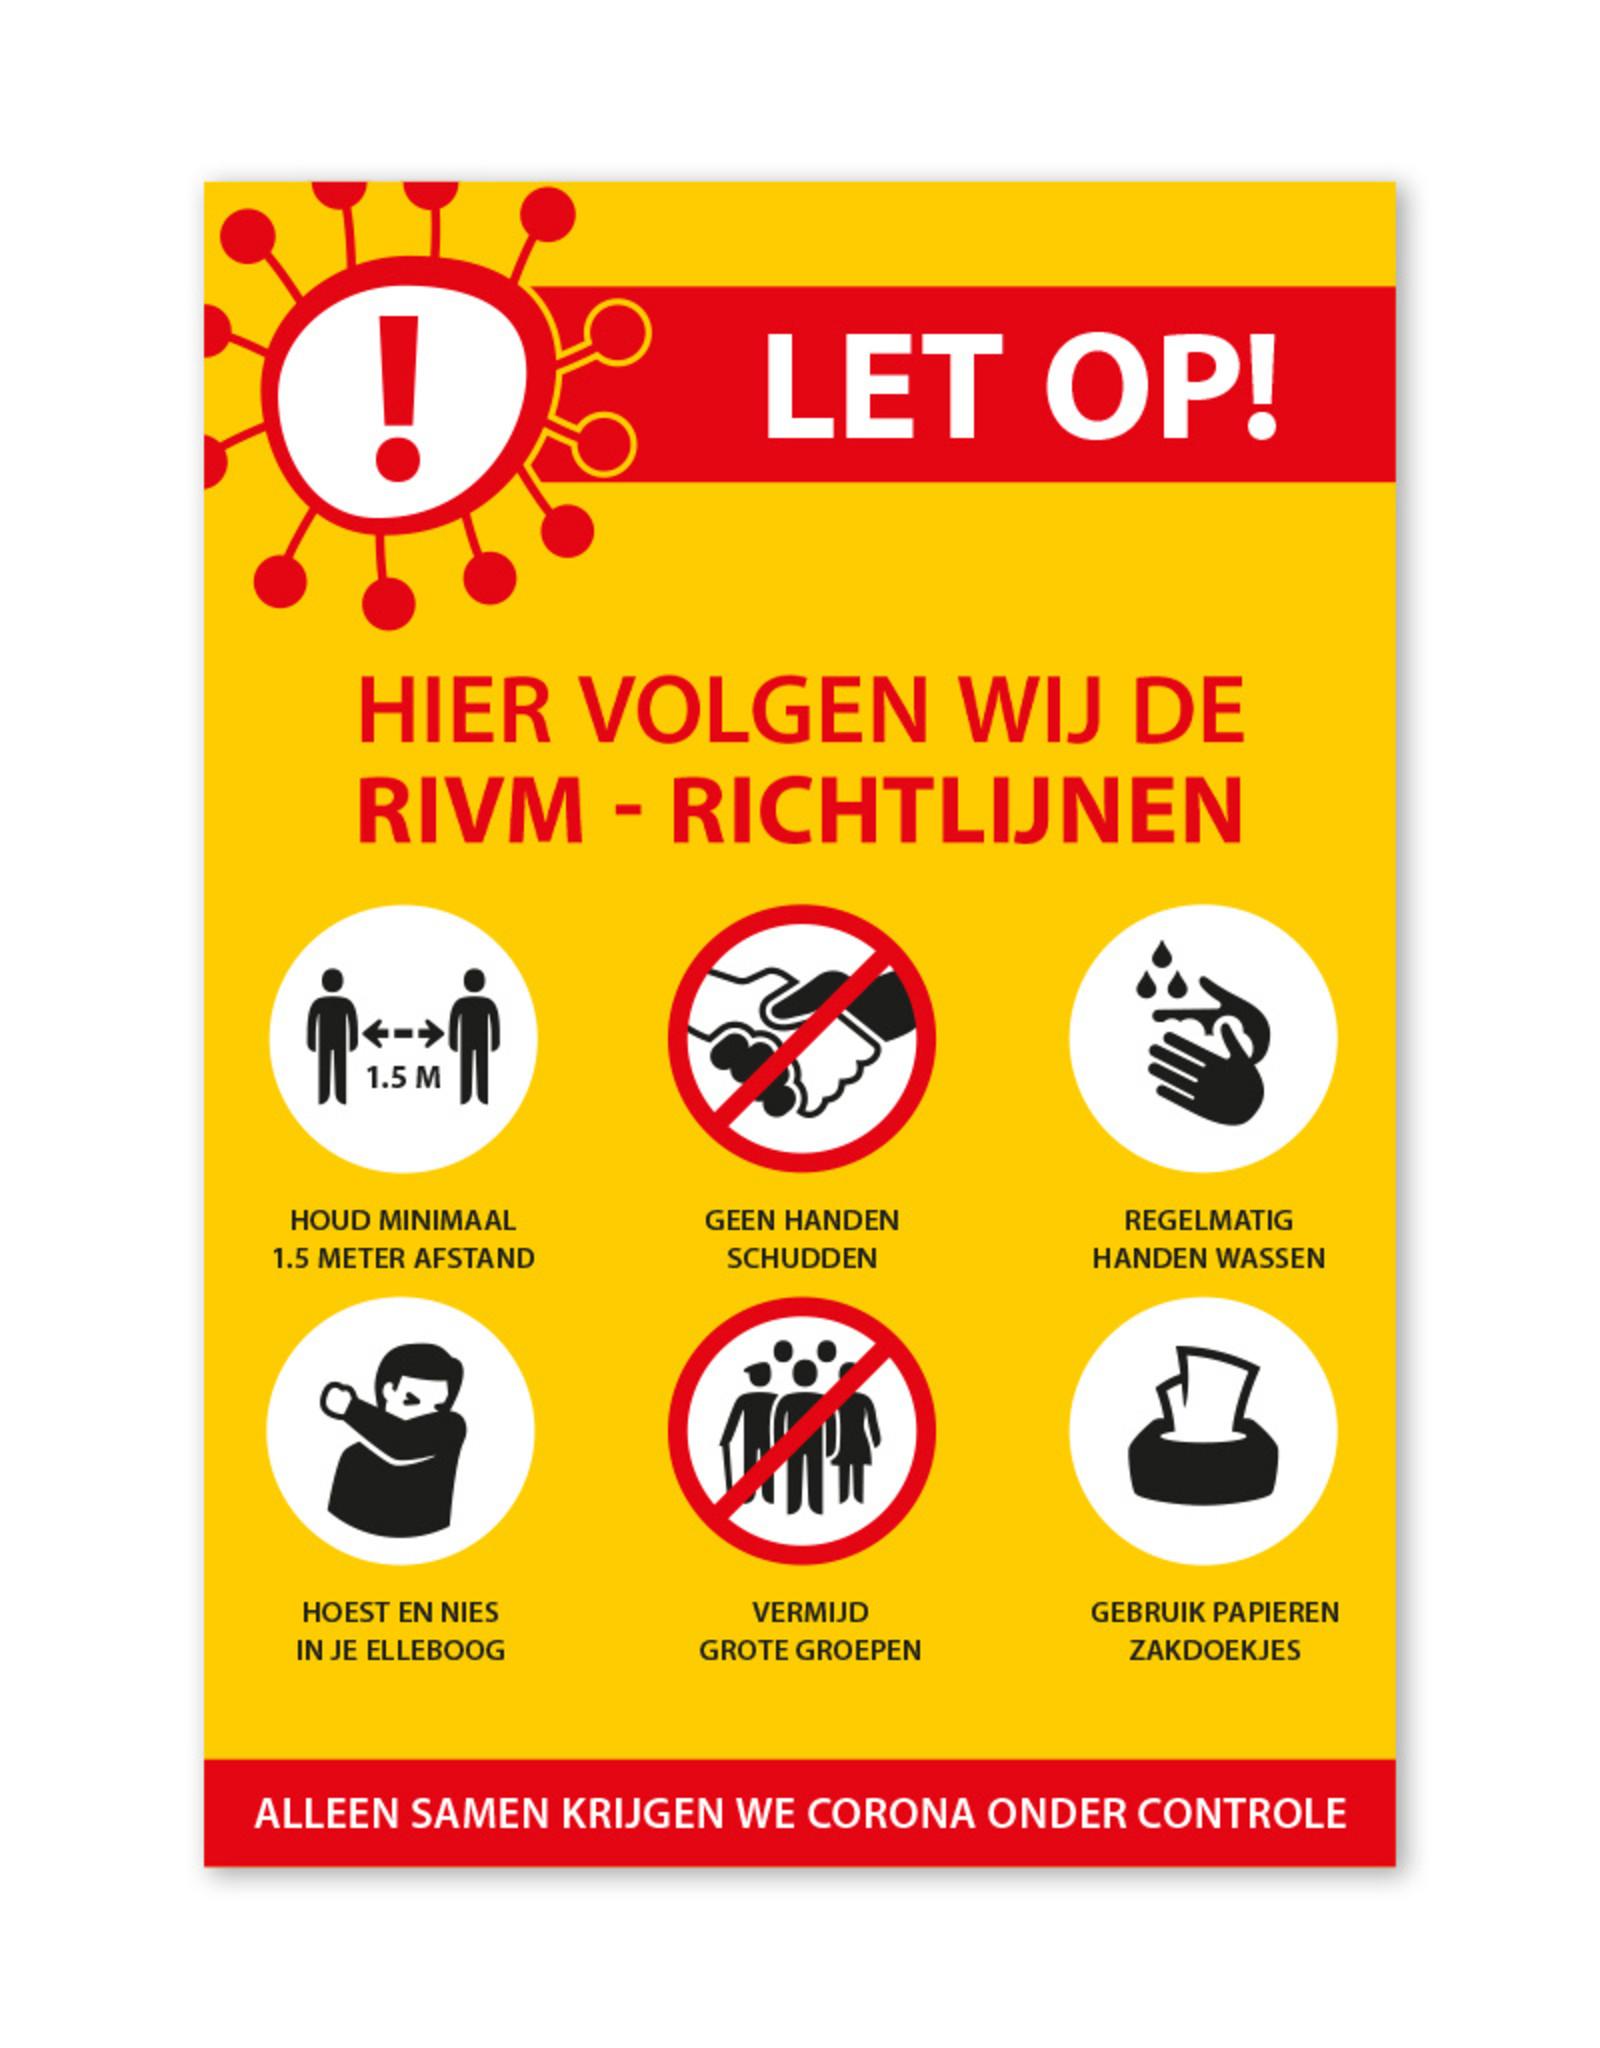 Sticker RIVM - Richtlijnen - Staand model